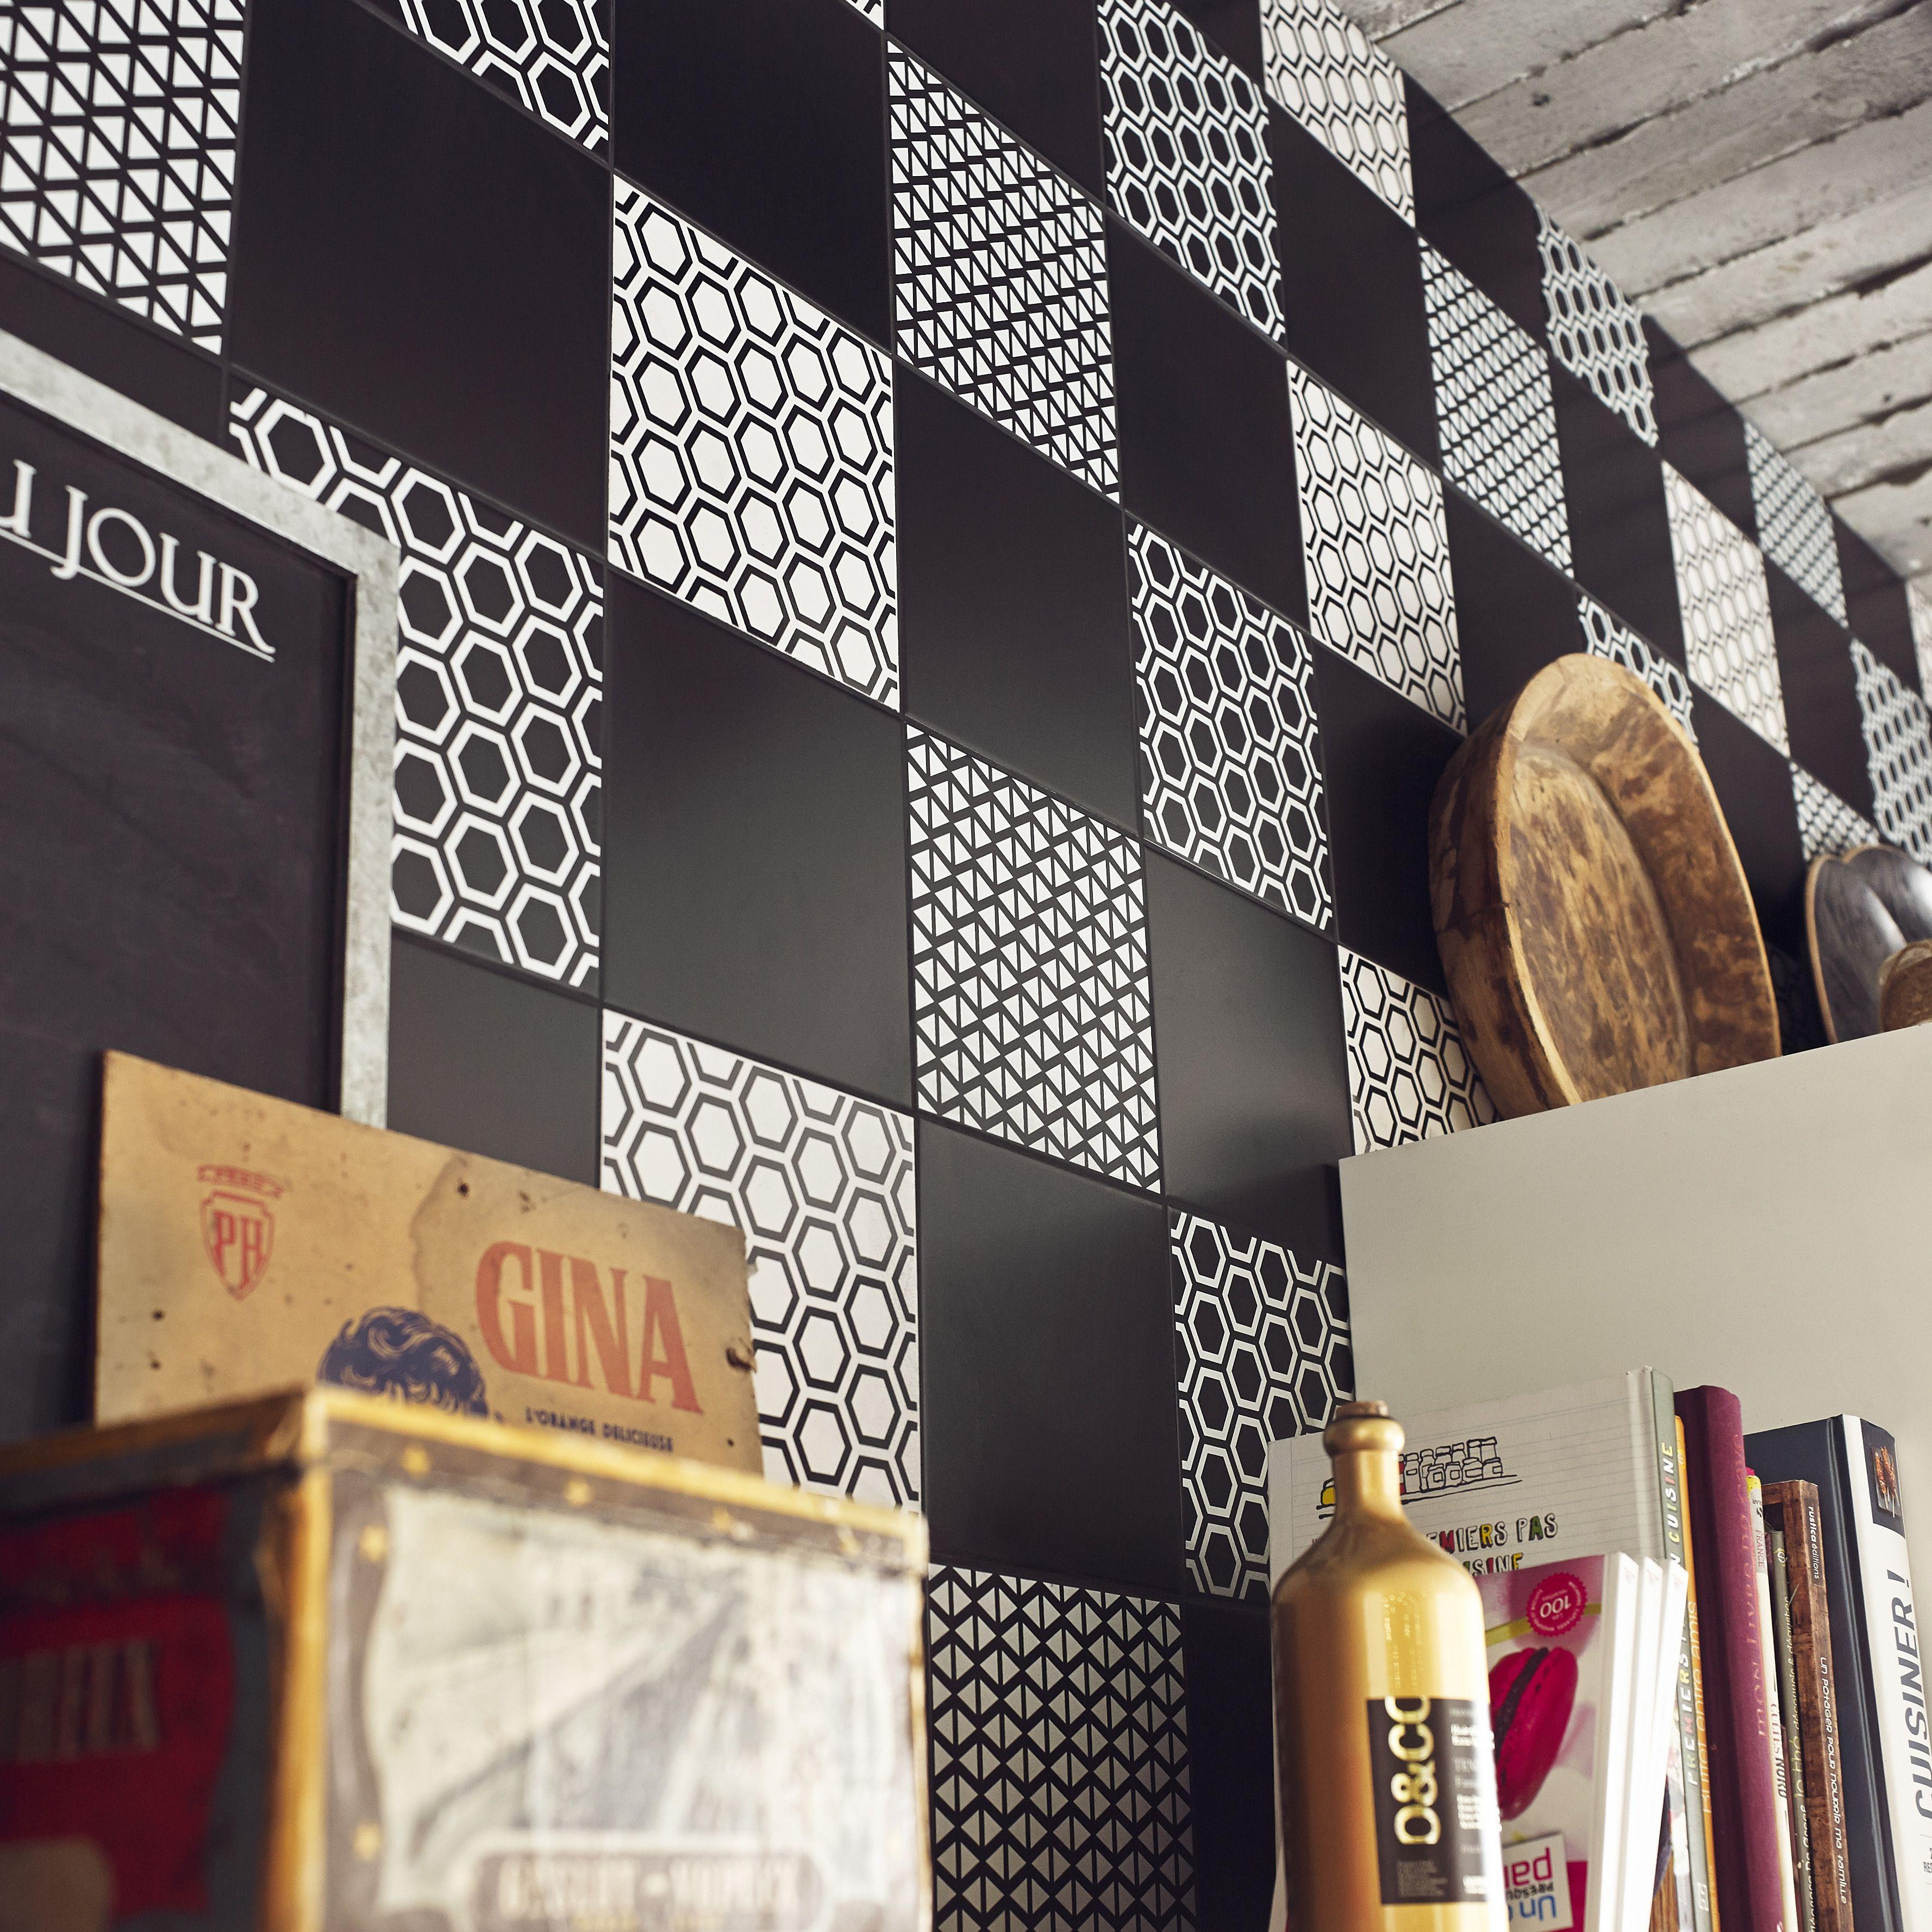 Carrelage Mur Forte Noir Noir N 0 Mat L 20 X L 20 Cm Astuce Mur